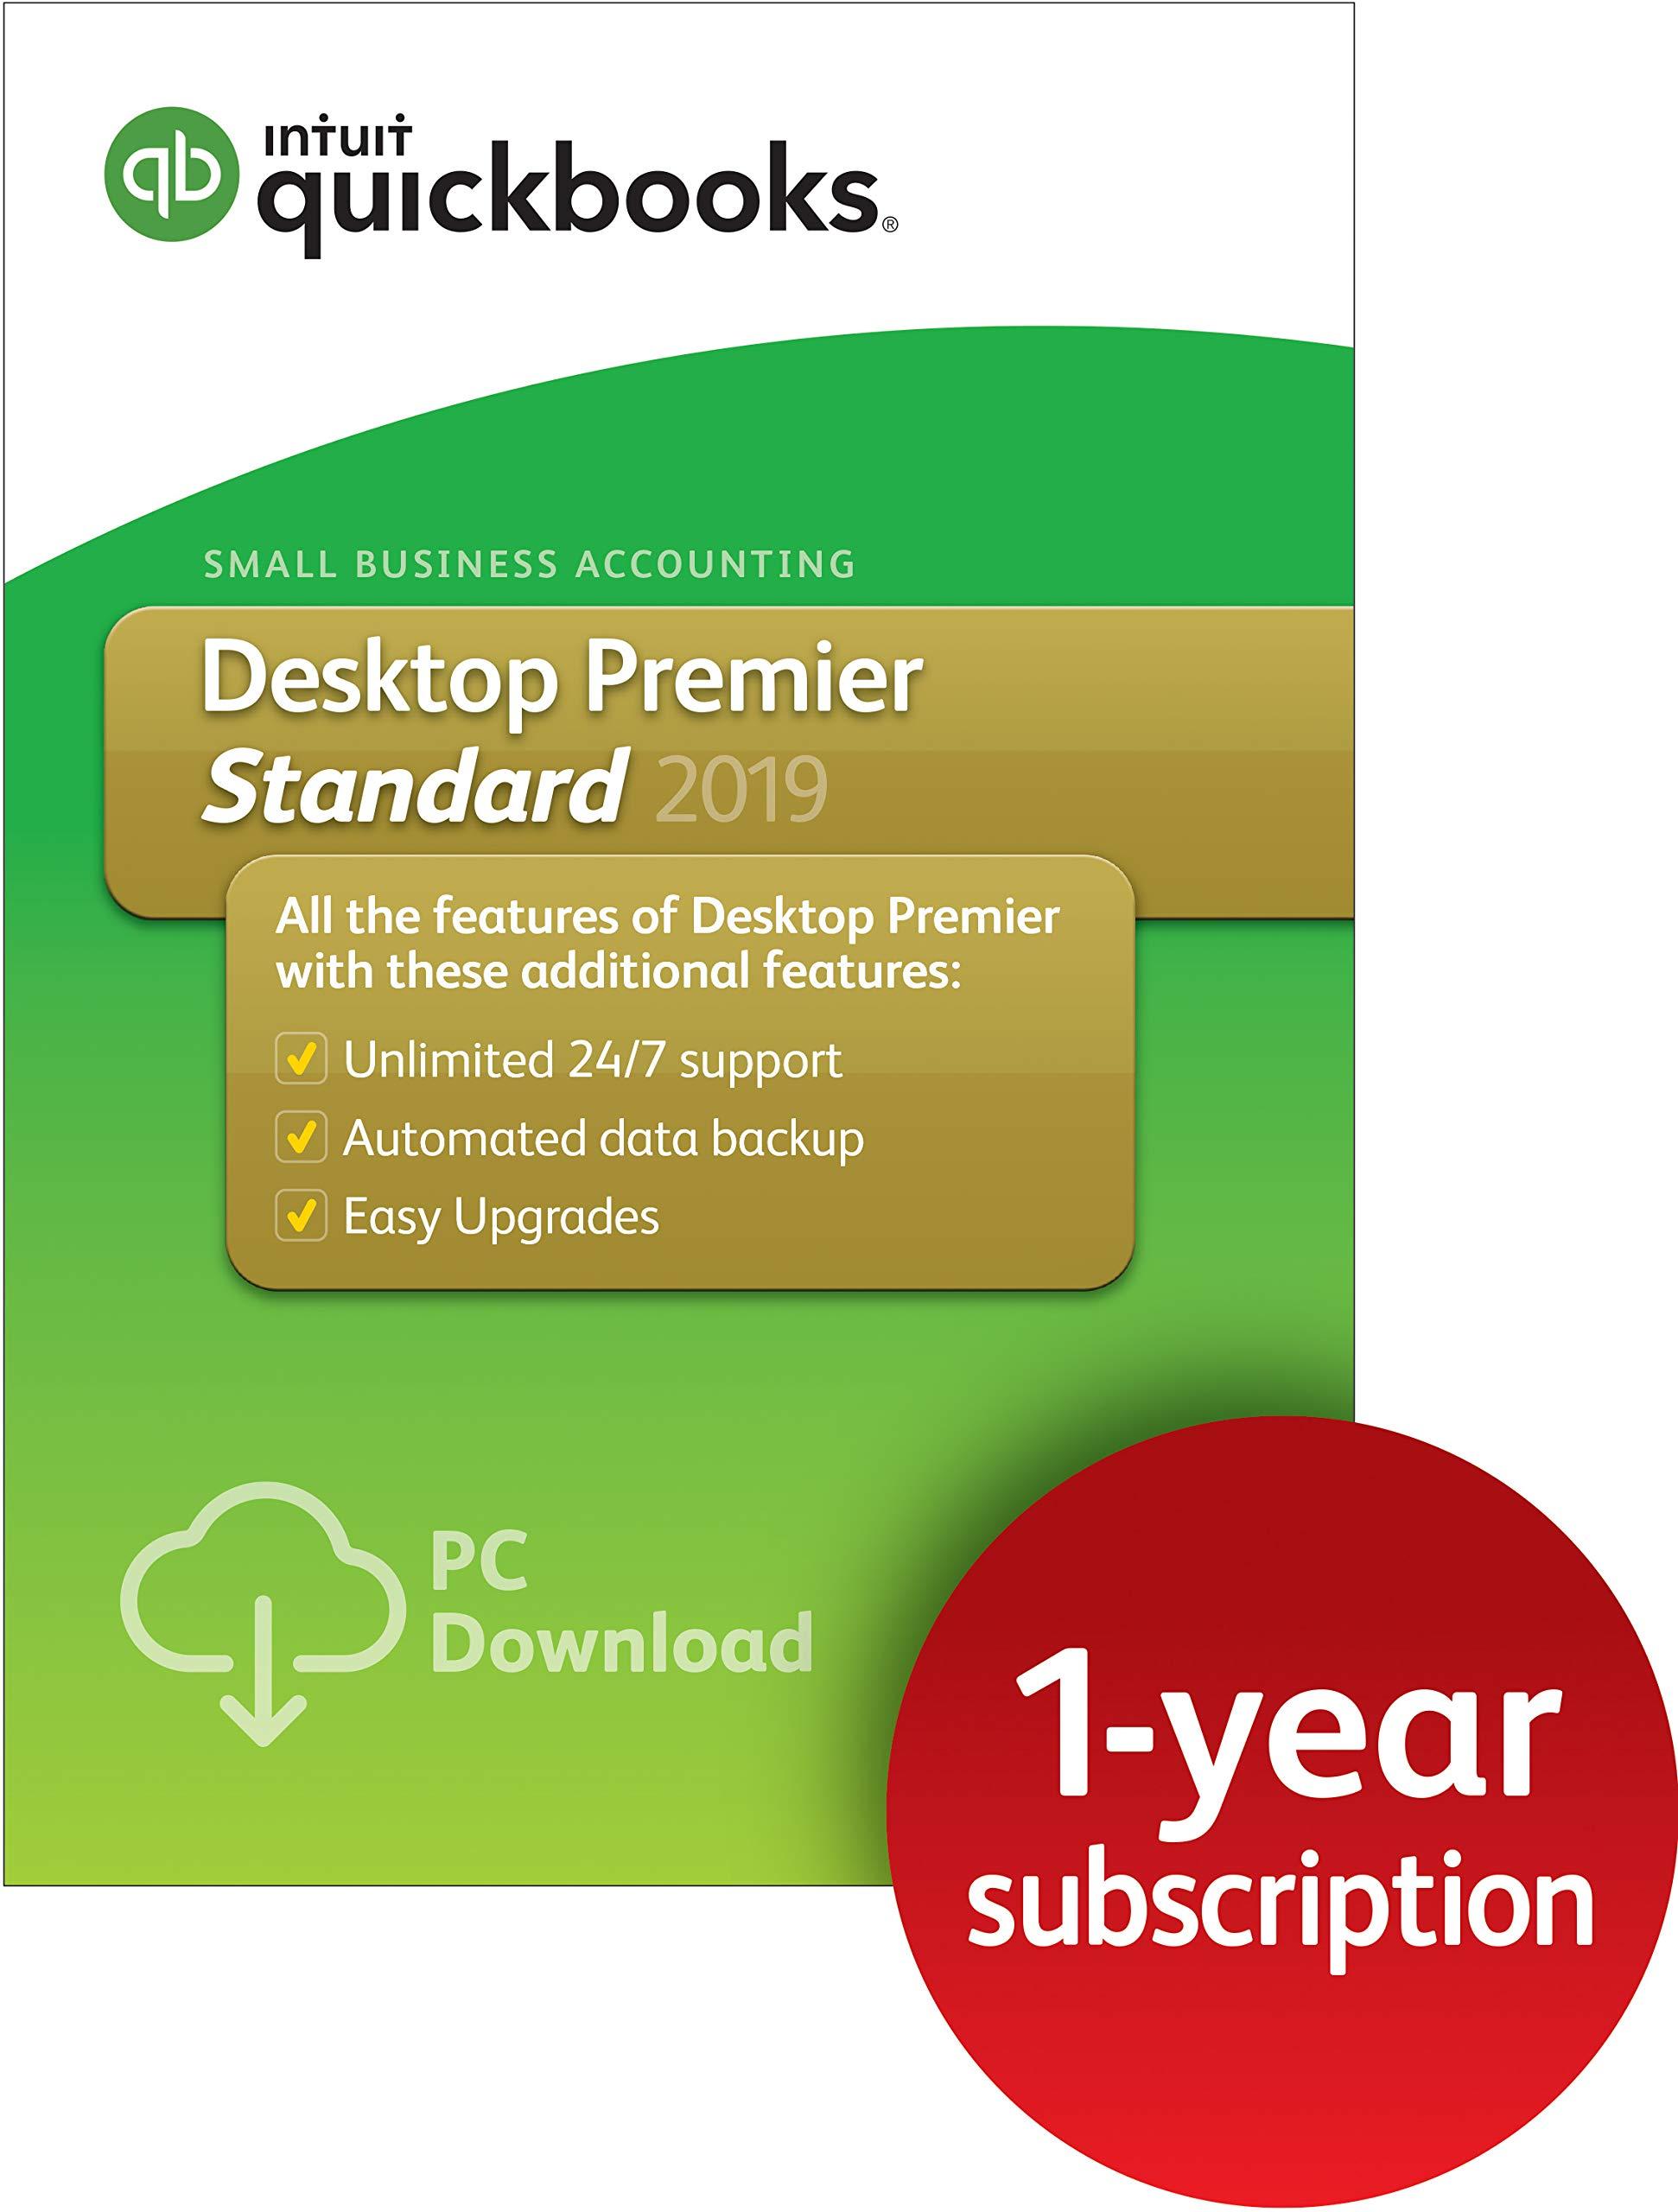 QuickBooks Desktop Premier Standard 2019, 1 Year Subscription [PC Download] by Intuit